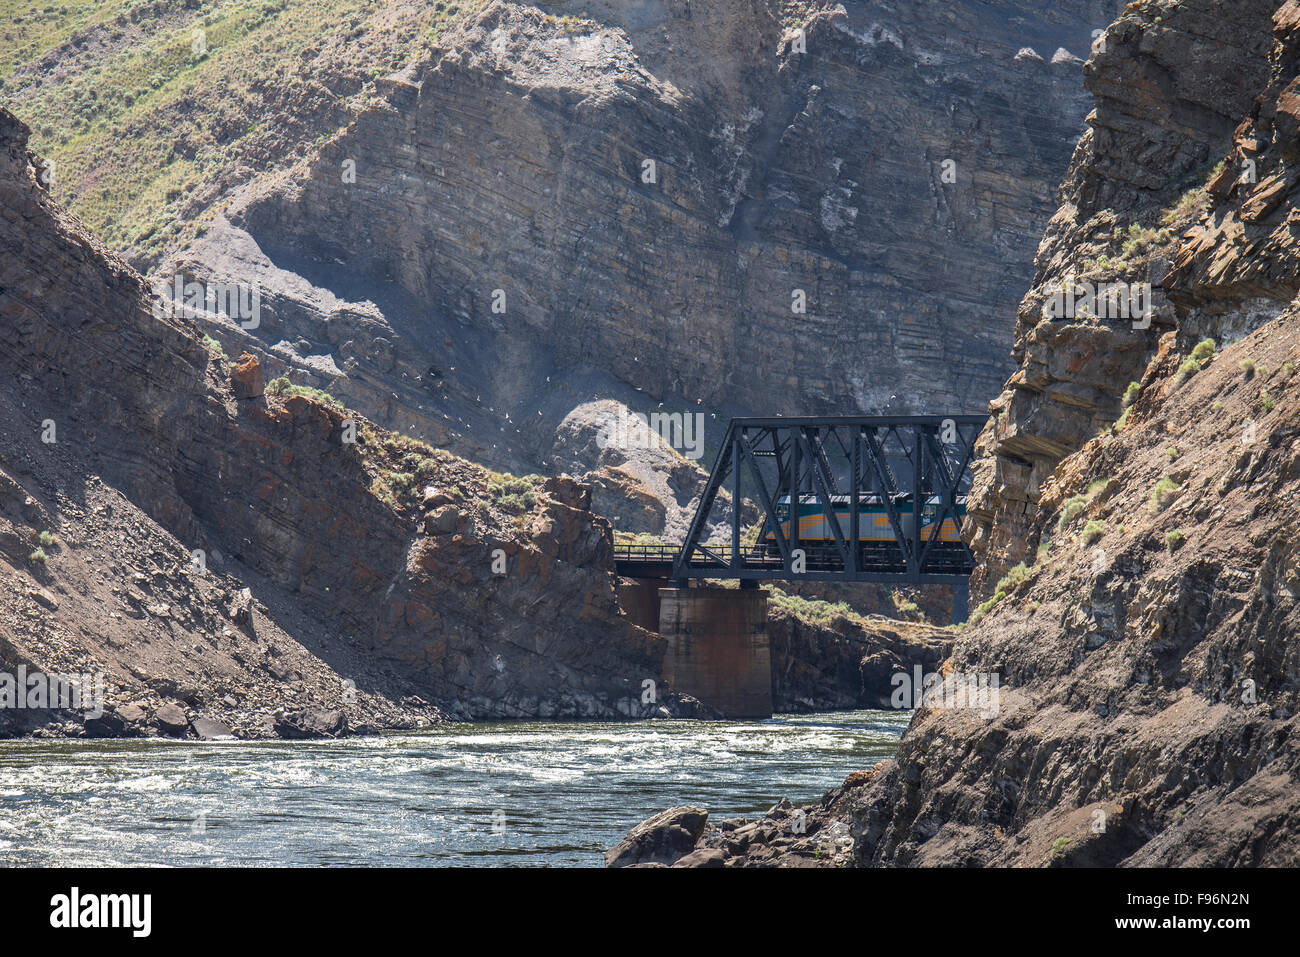 Train locomotive going over a trestle bridge in the Black Canyon near Ashcroft, British Columbia, Canada. - Stock Image